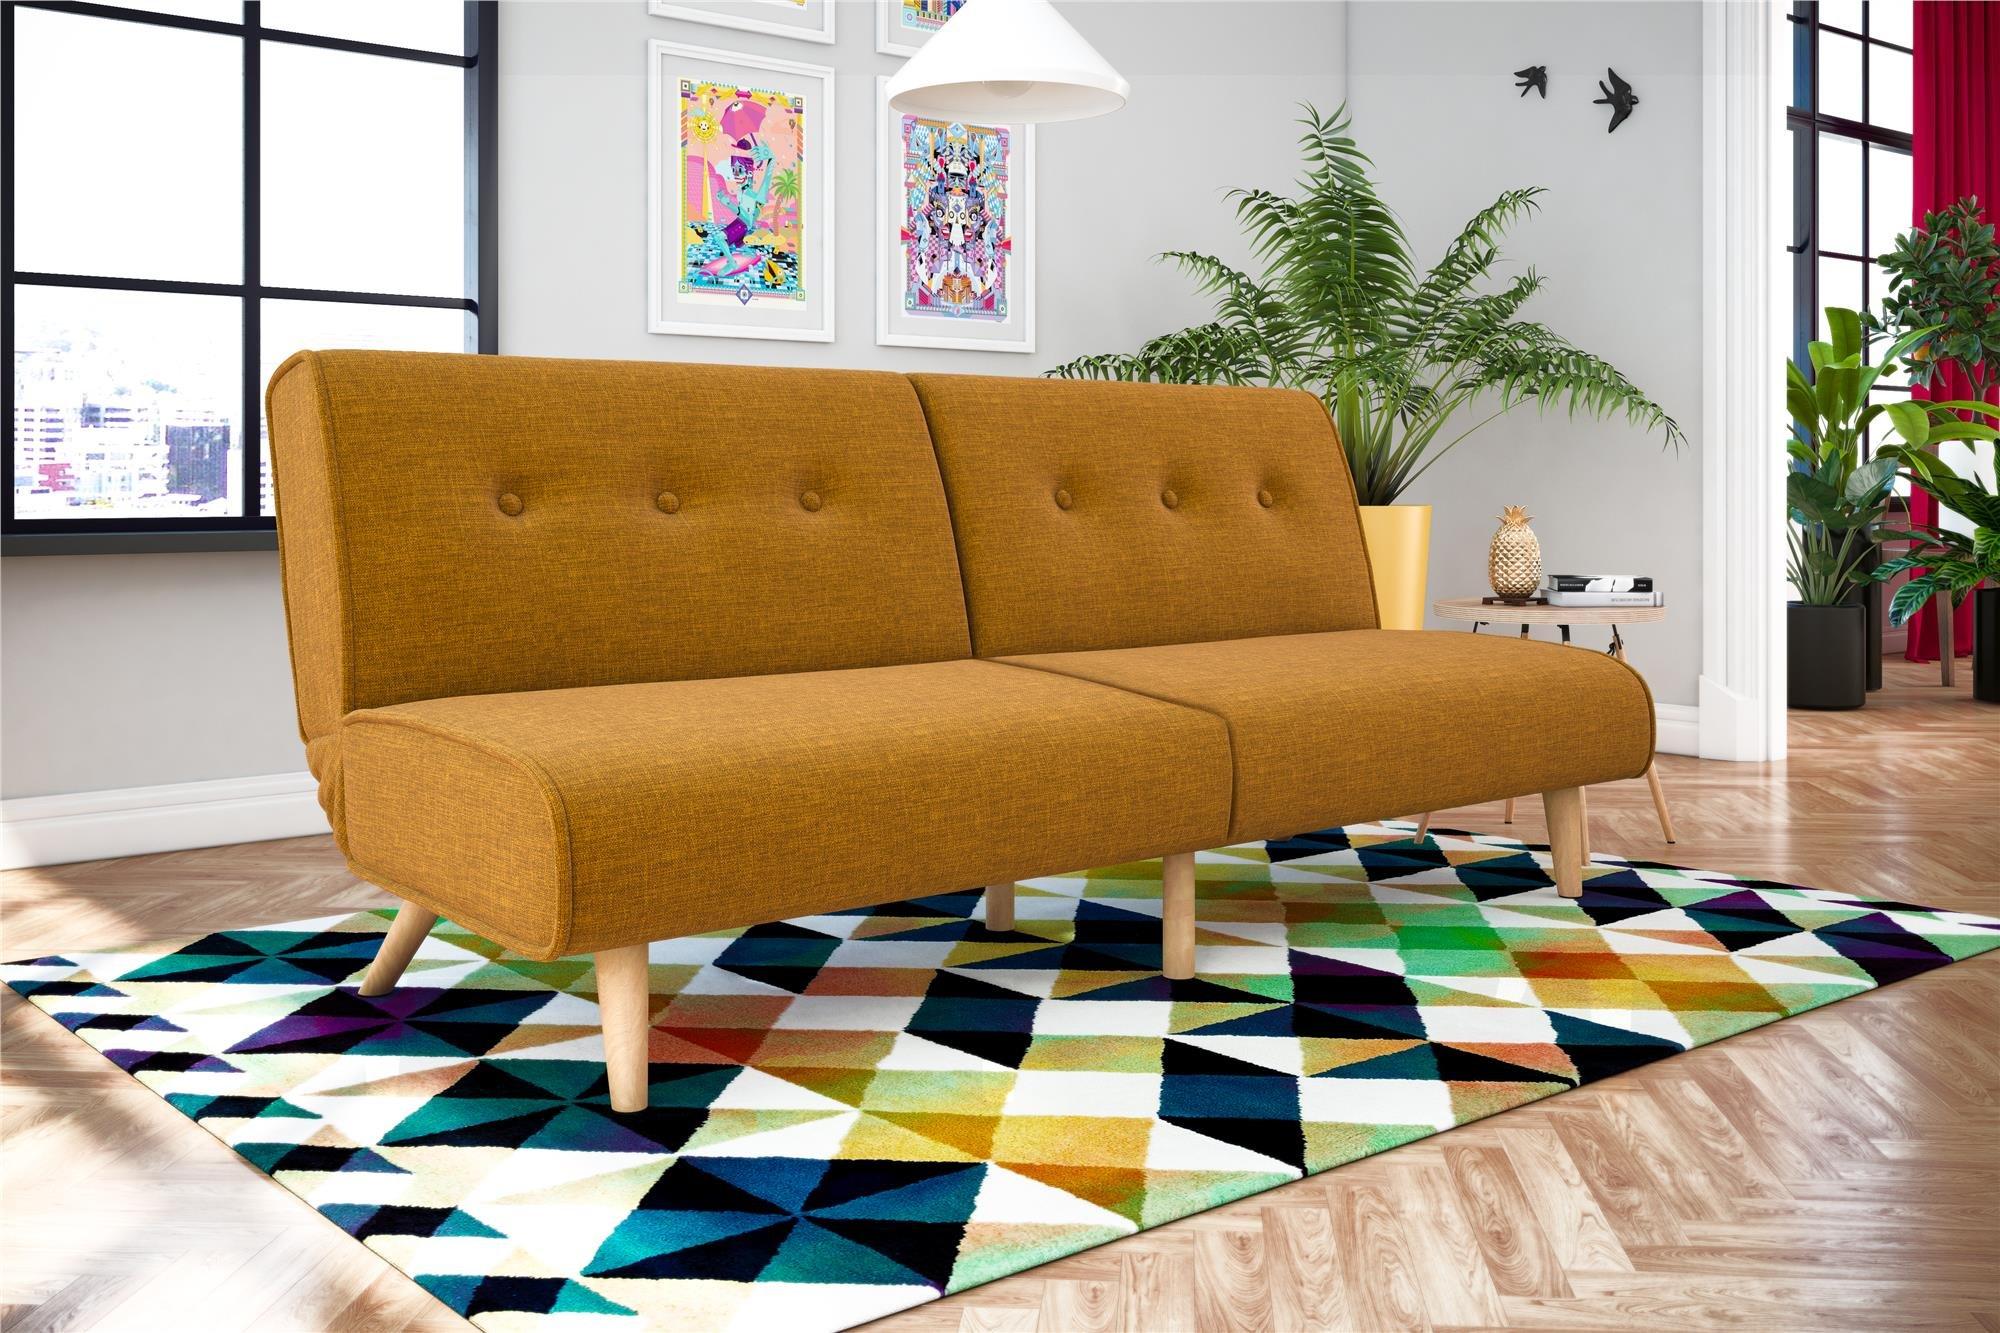 Novogratz Palm Springs Convertible Sofa Sleeper in Rich Linen, Sturdy Wooden Legs and Tufted Design, Mustard Linen by Novogratz